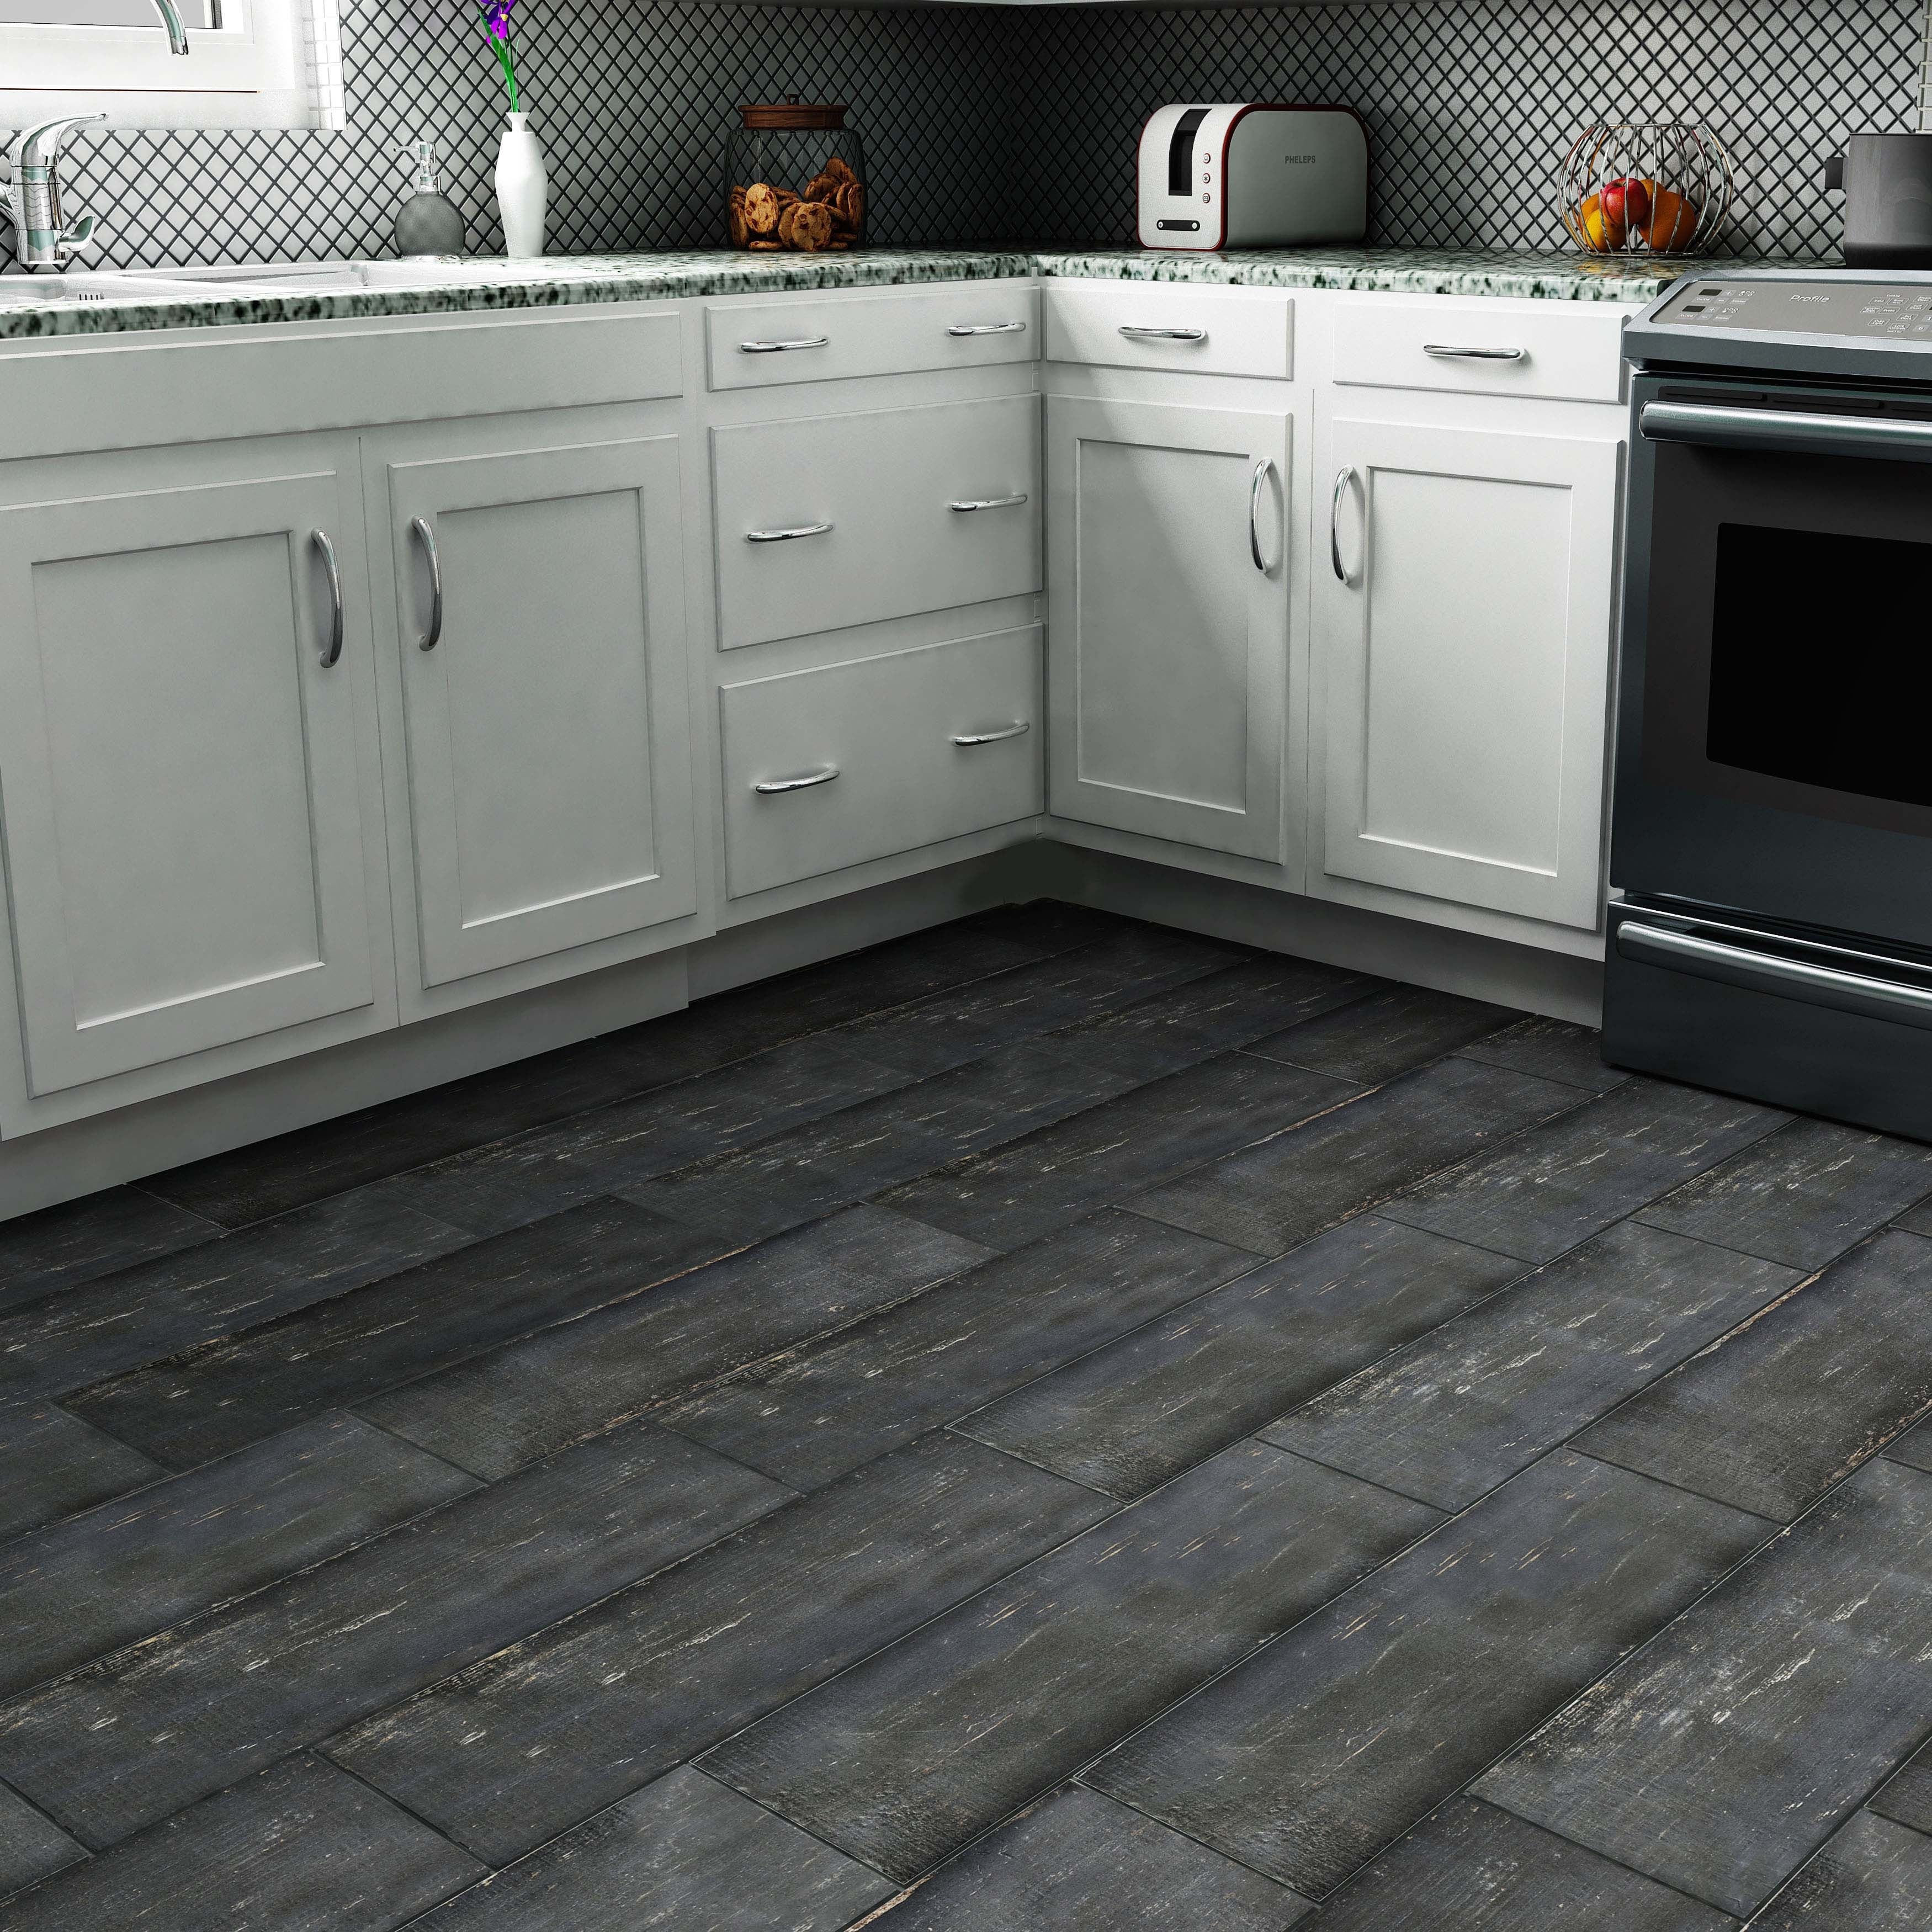 SomerTile 8 25x23 5 inch Lambris Negre Porcelain Floor and Wall Tile